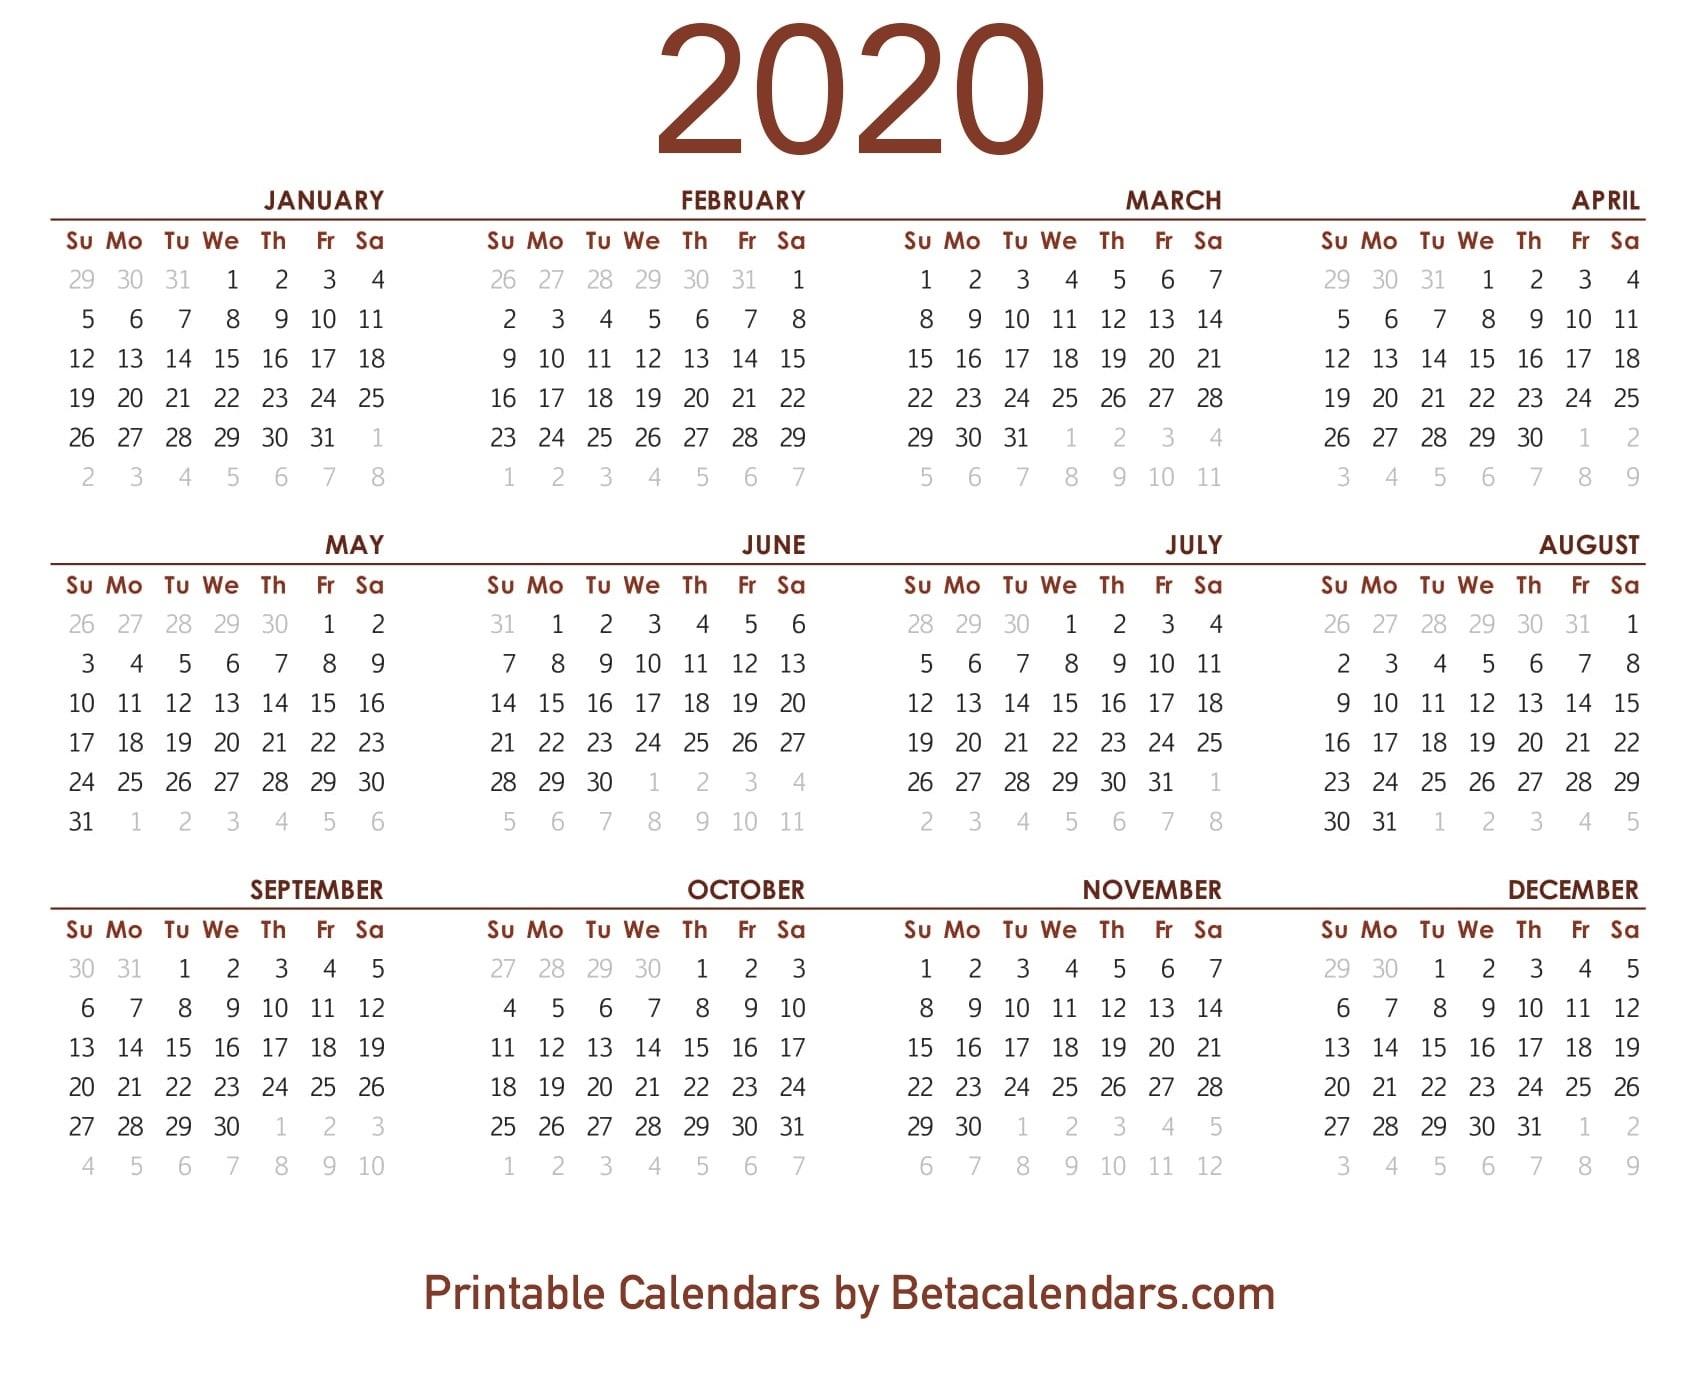 Make Your Own 2020 Calendar | Free Printable Calendar